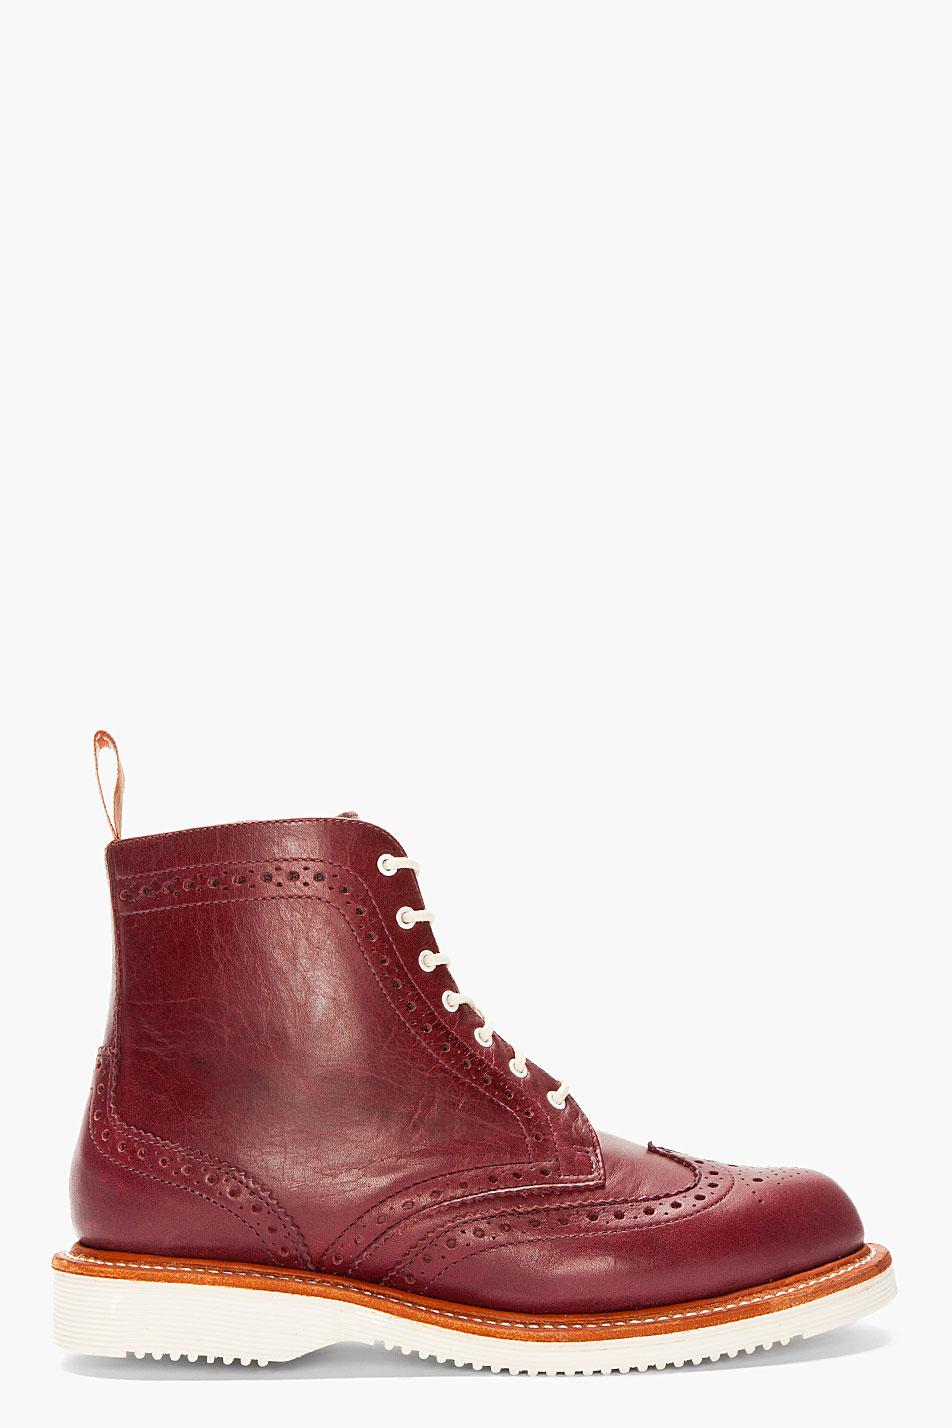 Dr Martens Burgundy Leather Bentley Wingtip Brogue Boots